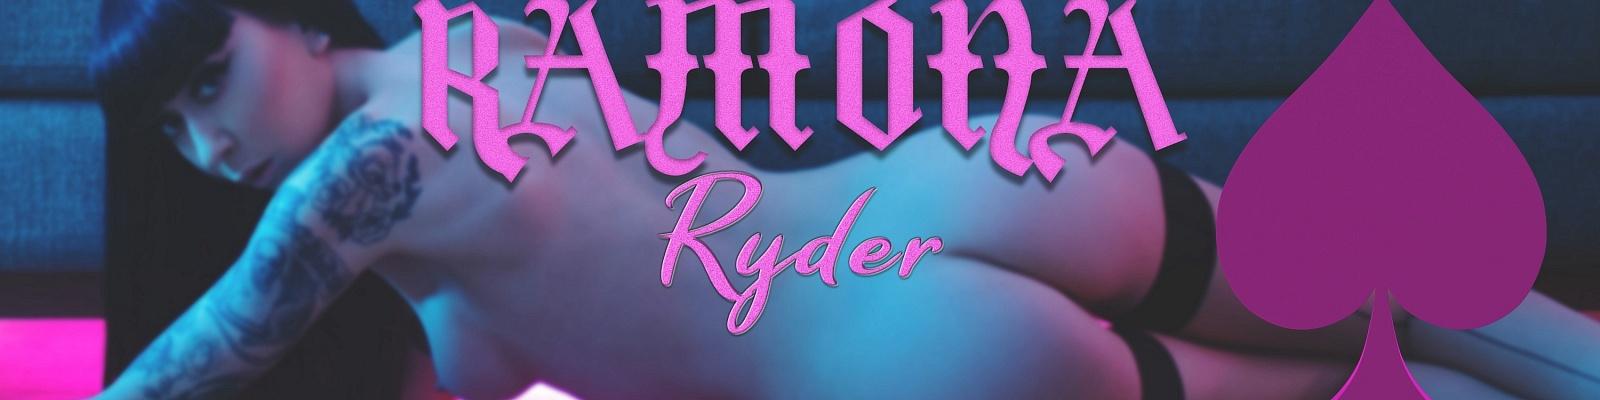 Mistress Ramona Ryder NYC & SF Escort